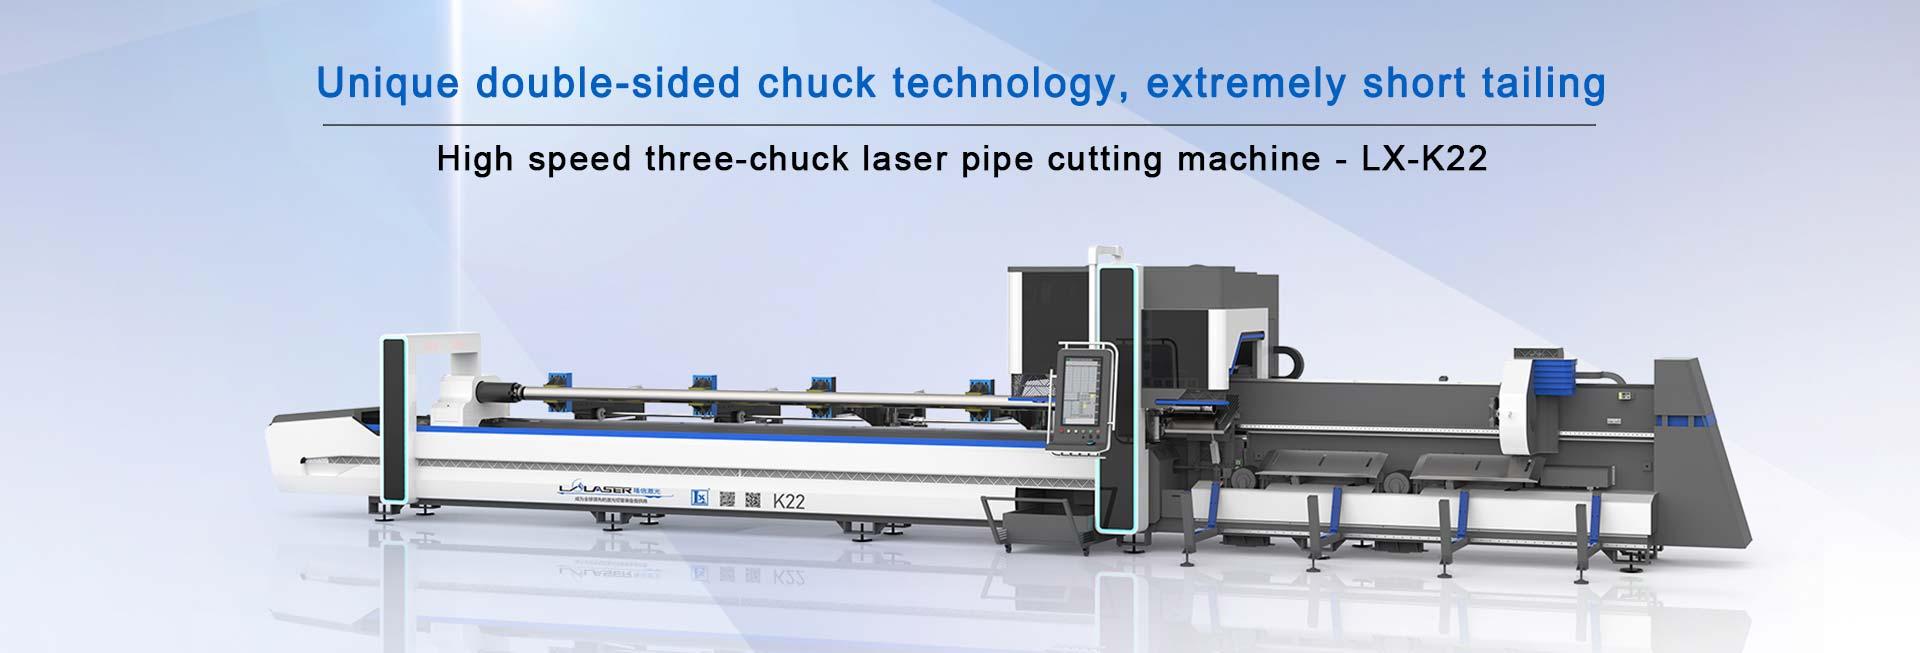 High speed three-chuck zero tailing laser pipe cutting machine K22